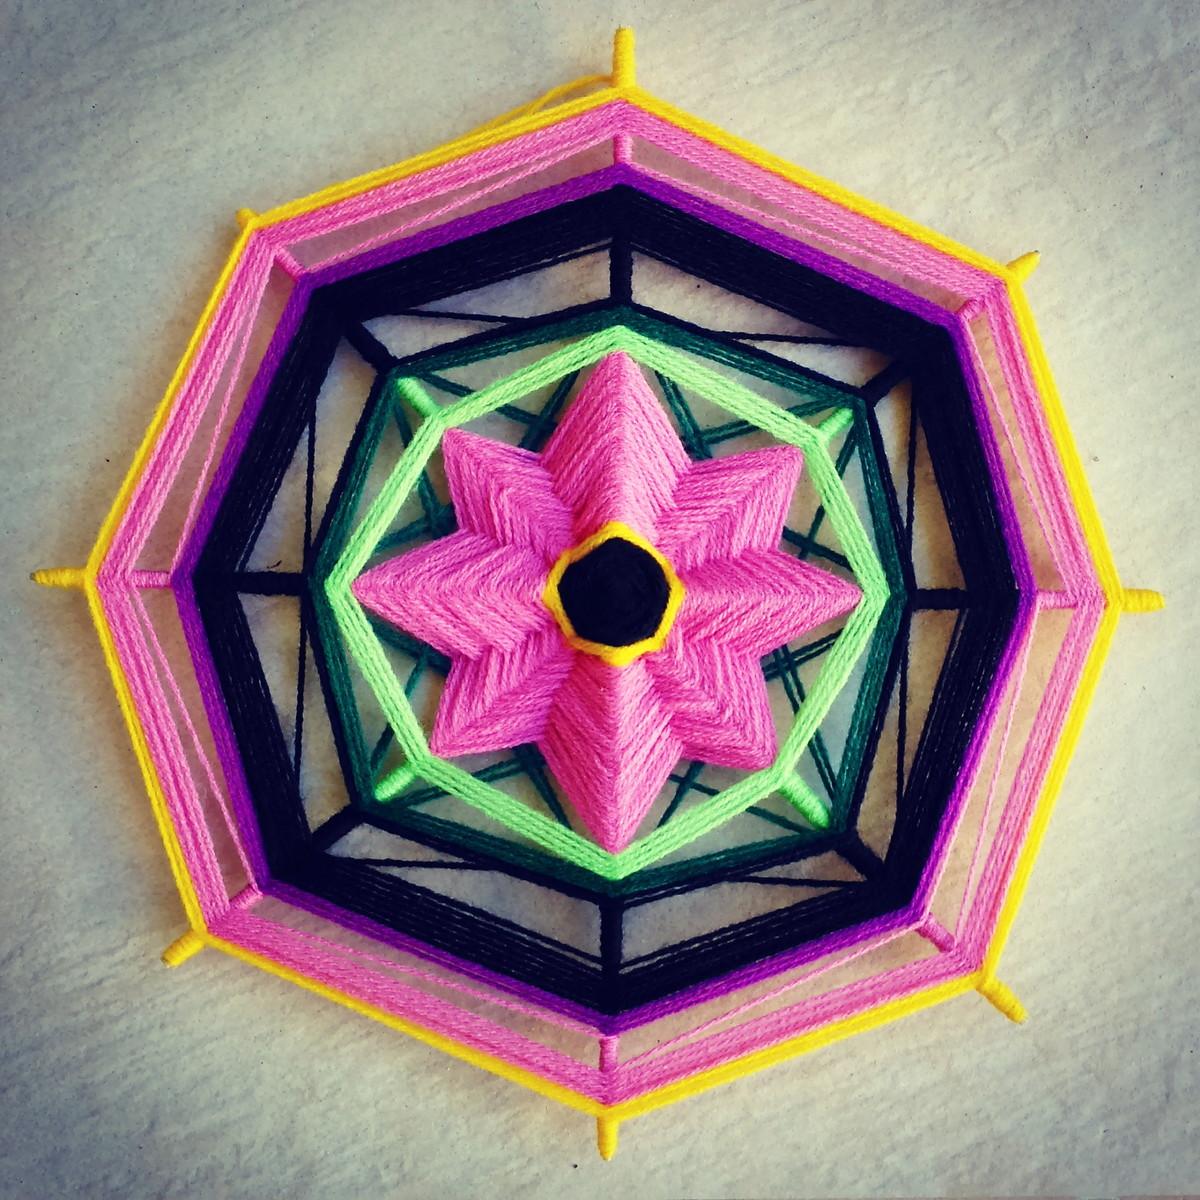 Mandala flor harmonia e cor elo7 for Cuadros mandalas feng shui decoracion mandalas